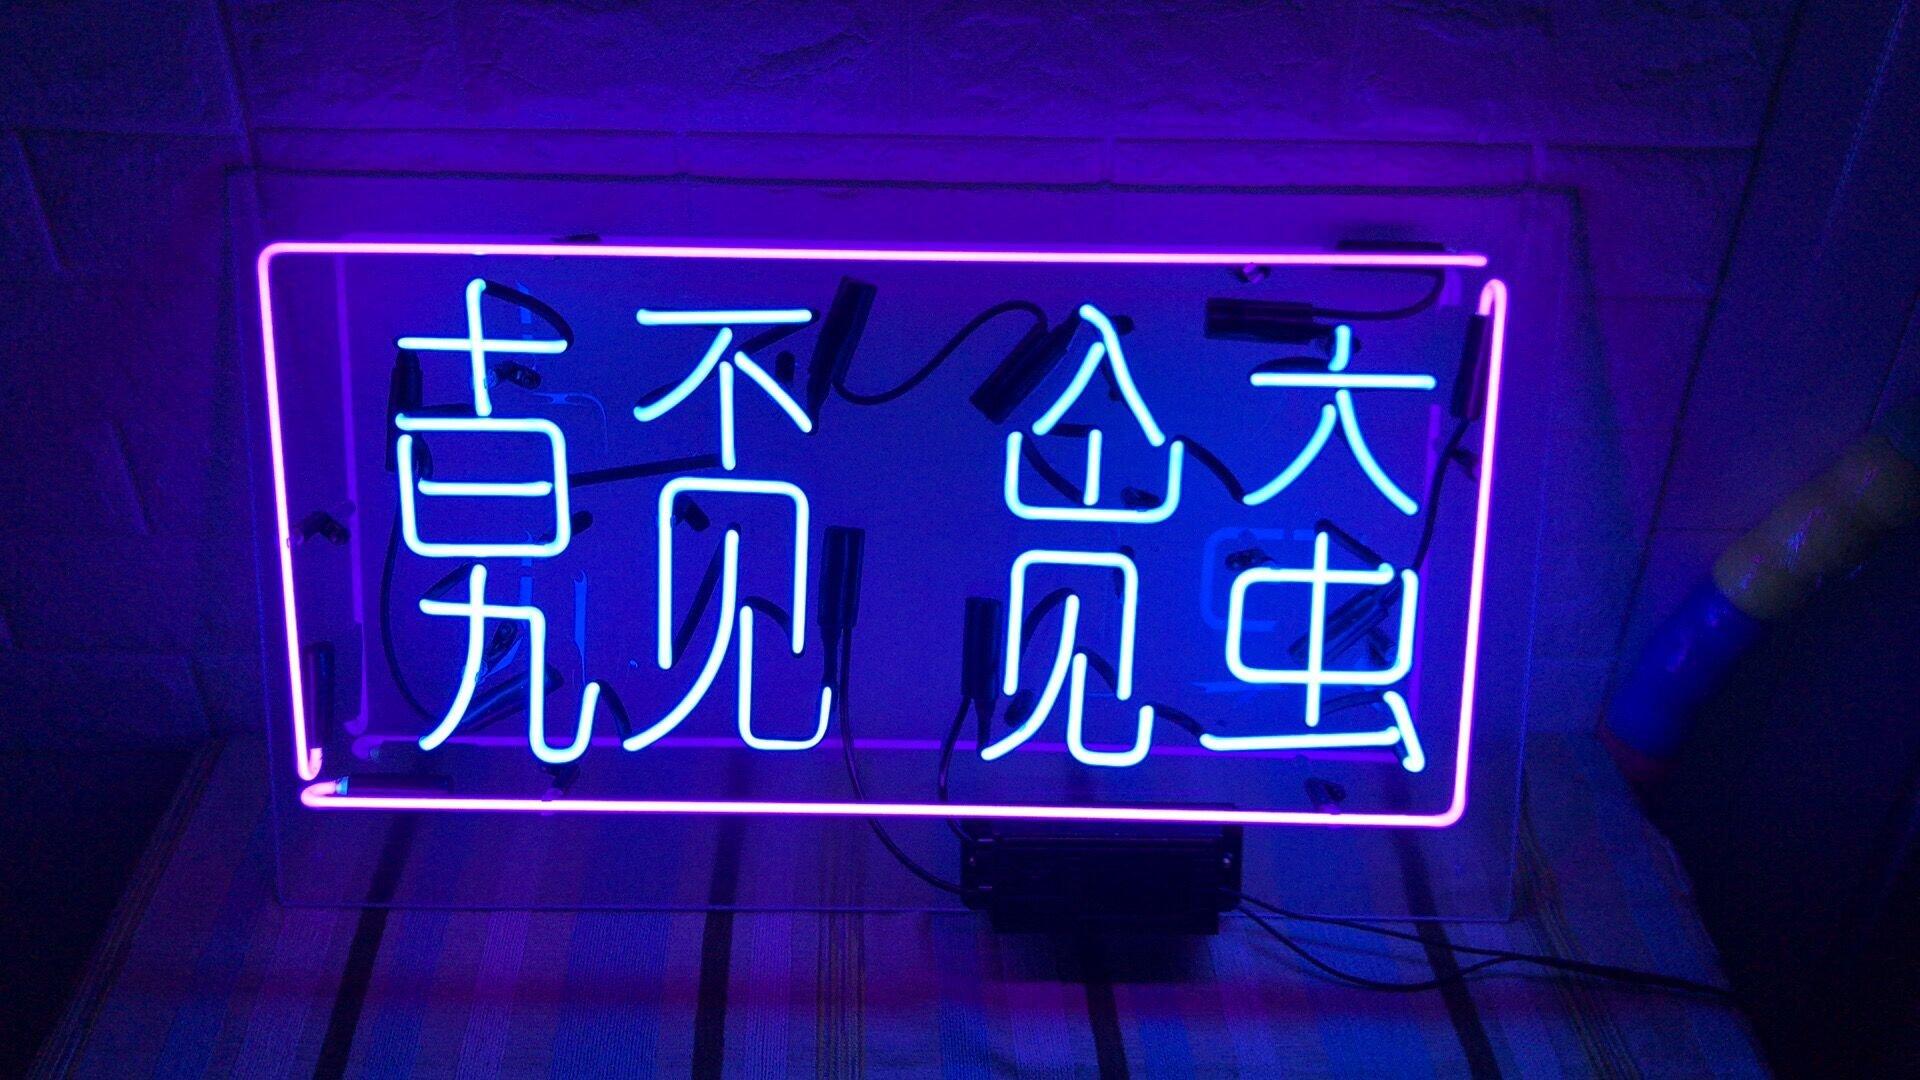 Neon Light Sign Custom Funny Wall Decor Lamp Light 24X11 Inches